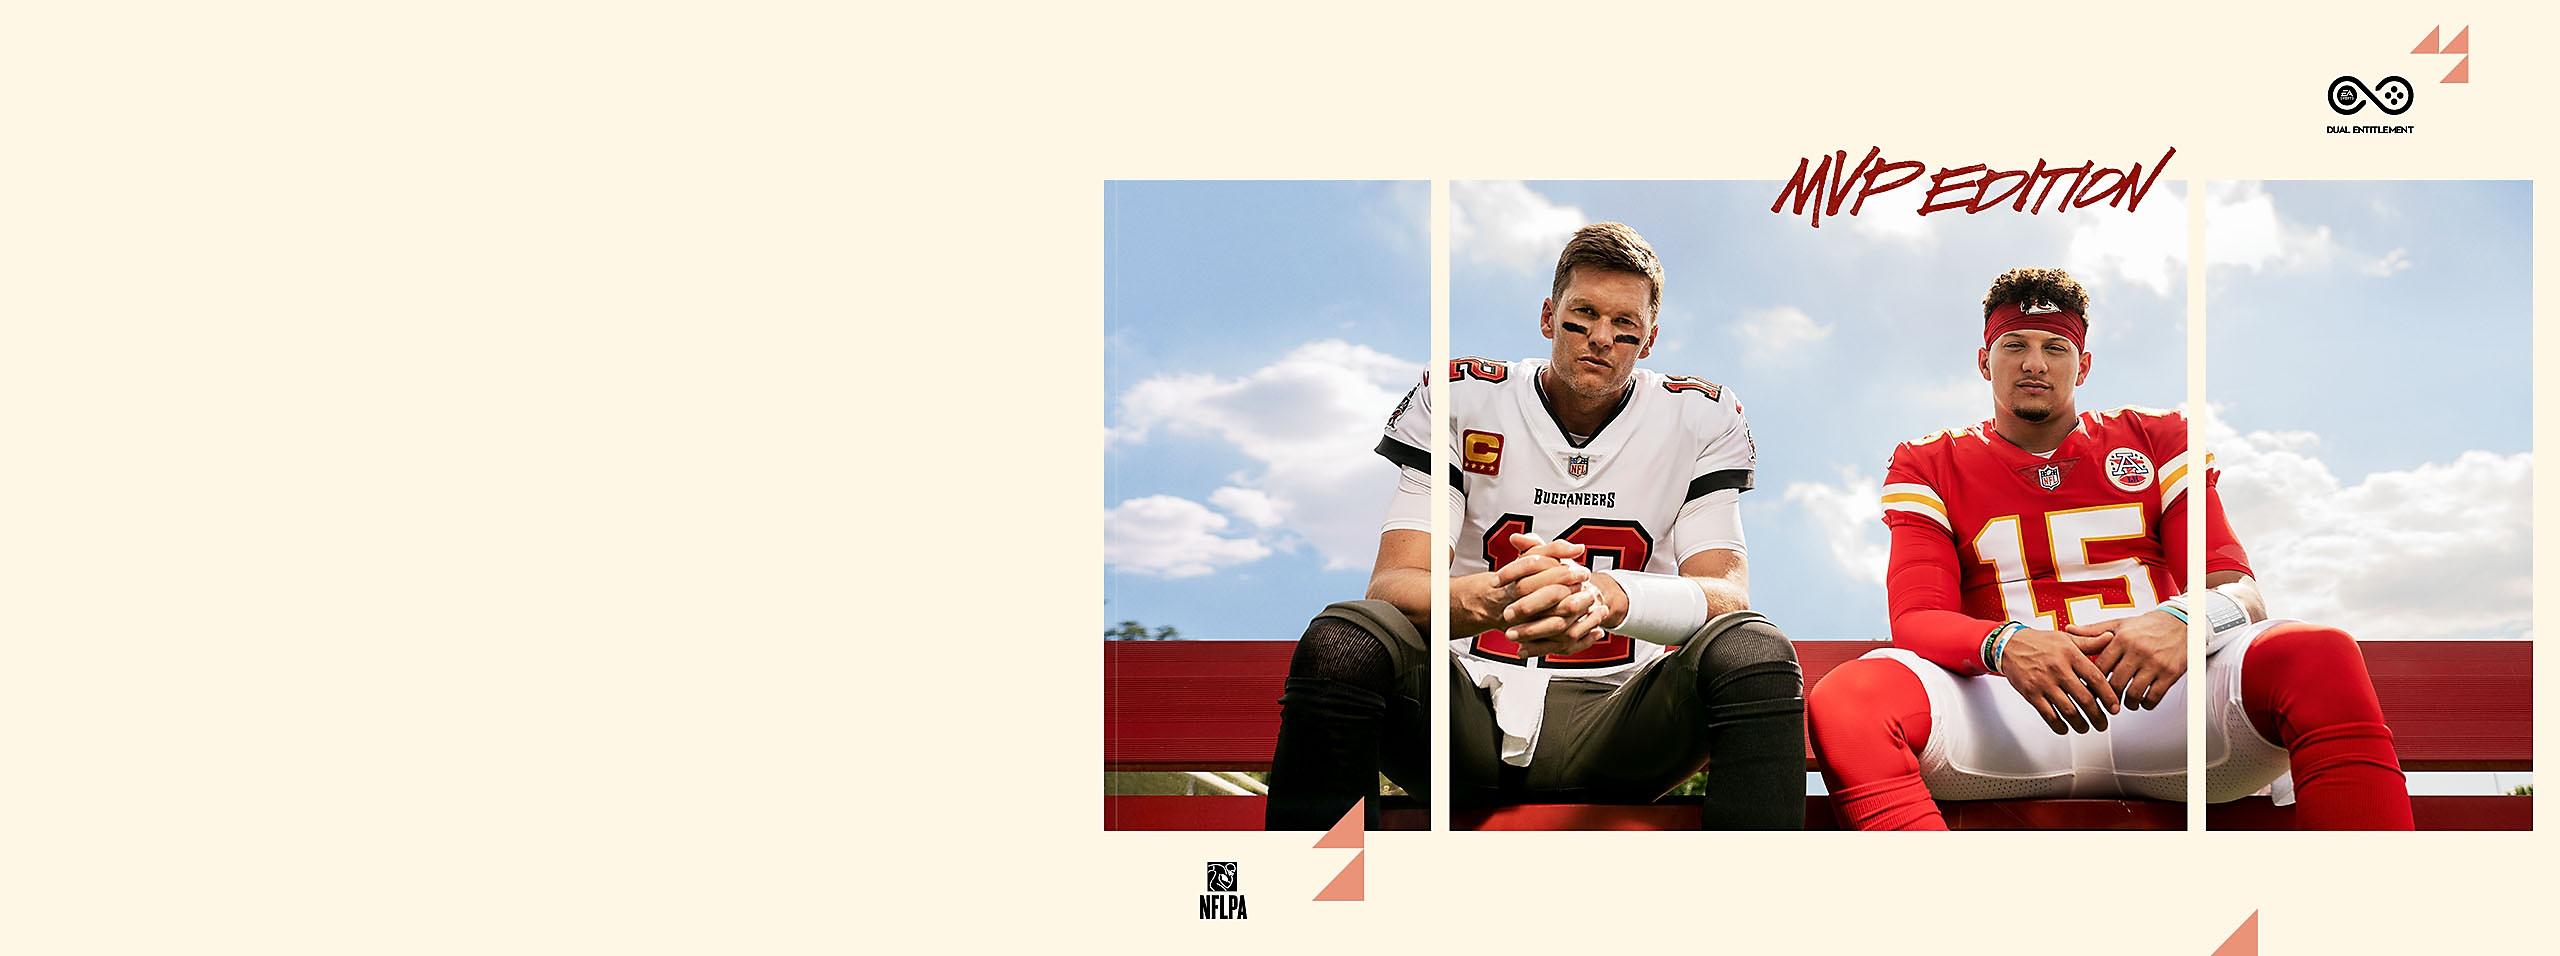 Madden NFL 22 hero image